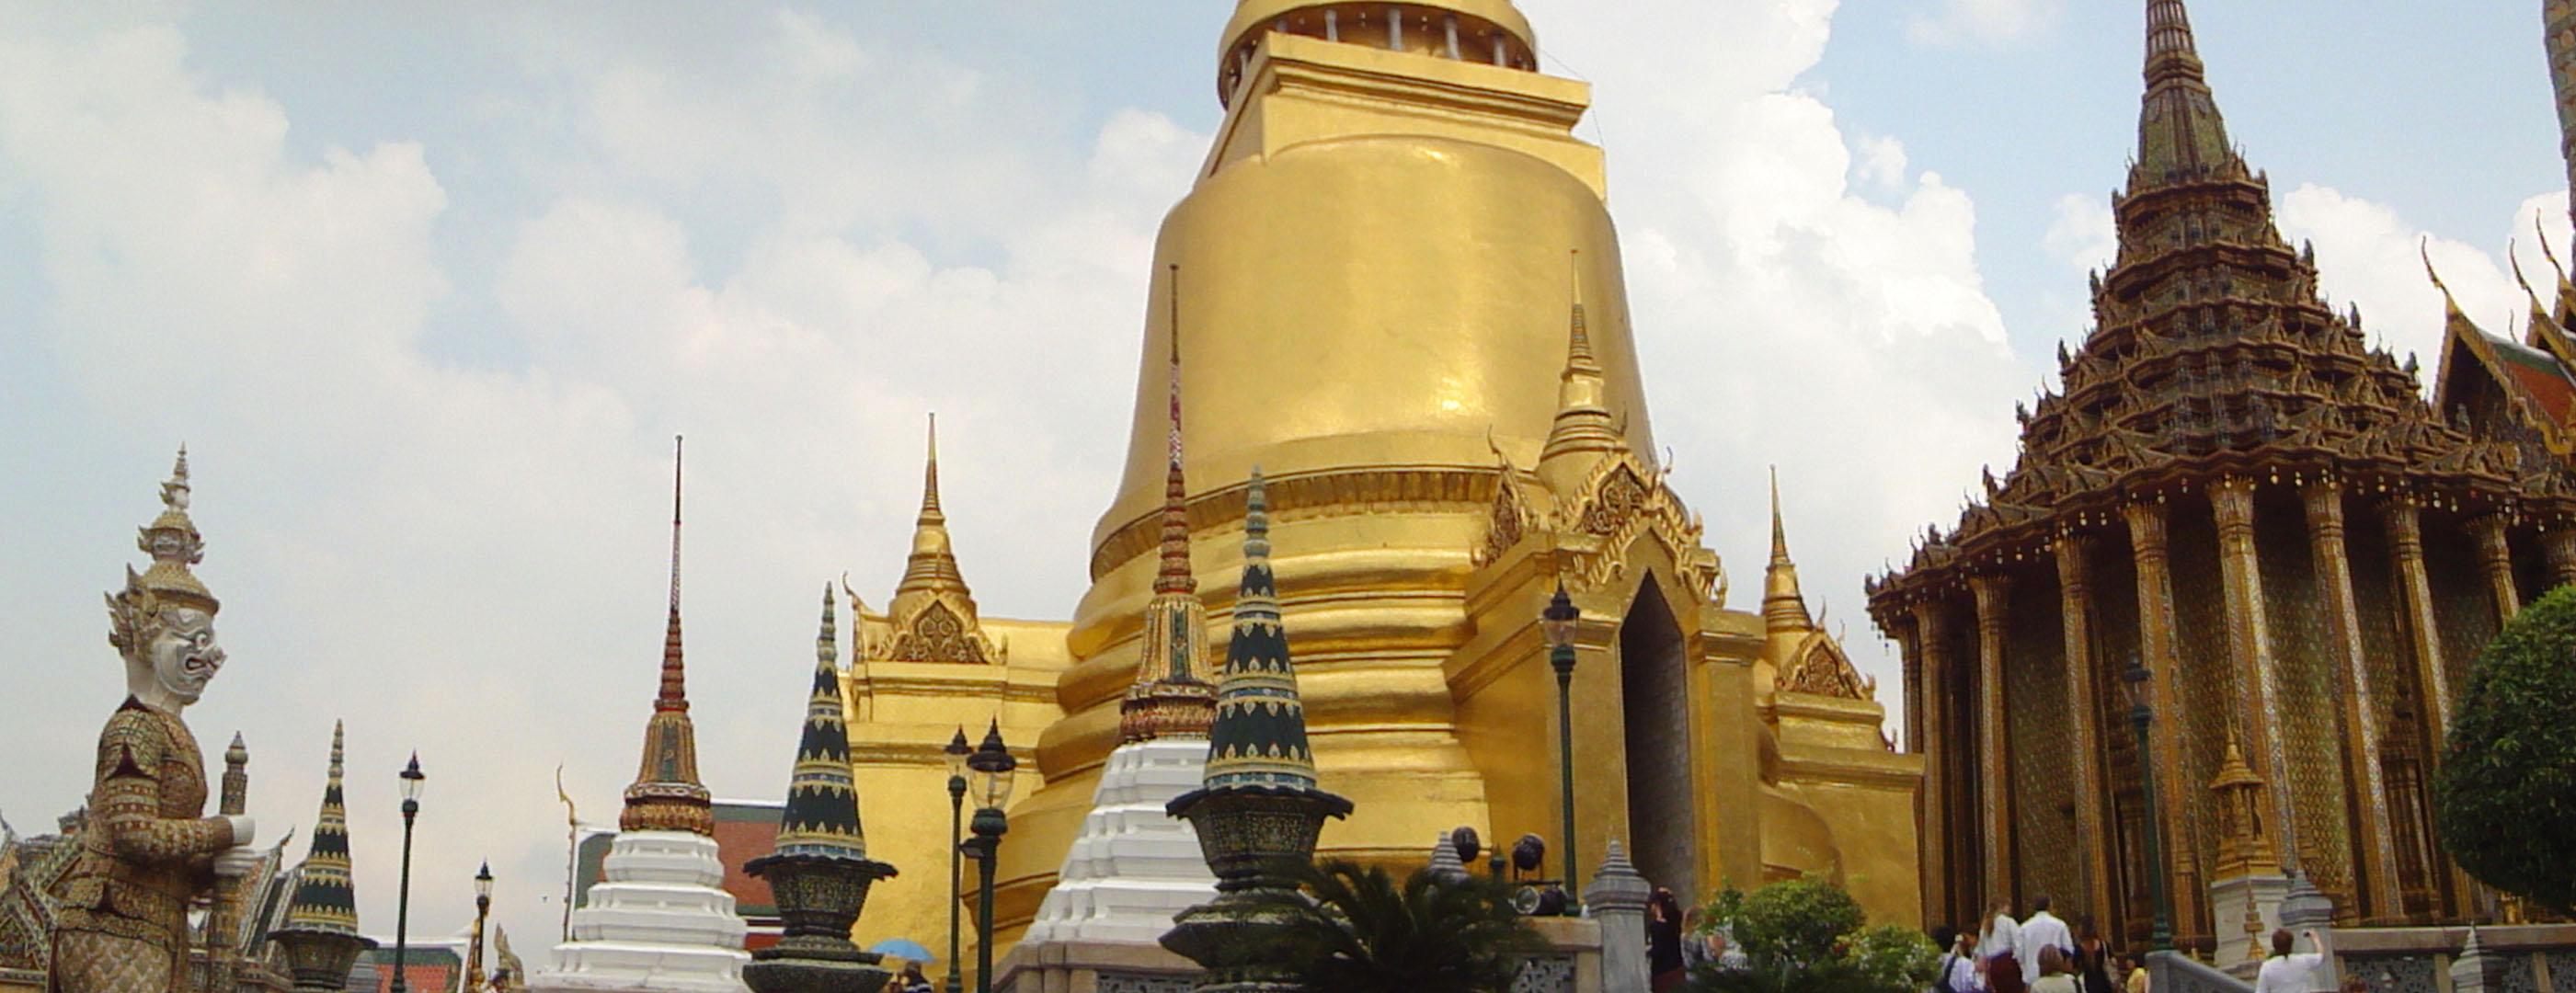 03 Phra Siratana Chedi Grand Palace Bangkok 2010 03